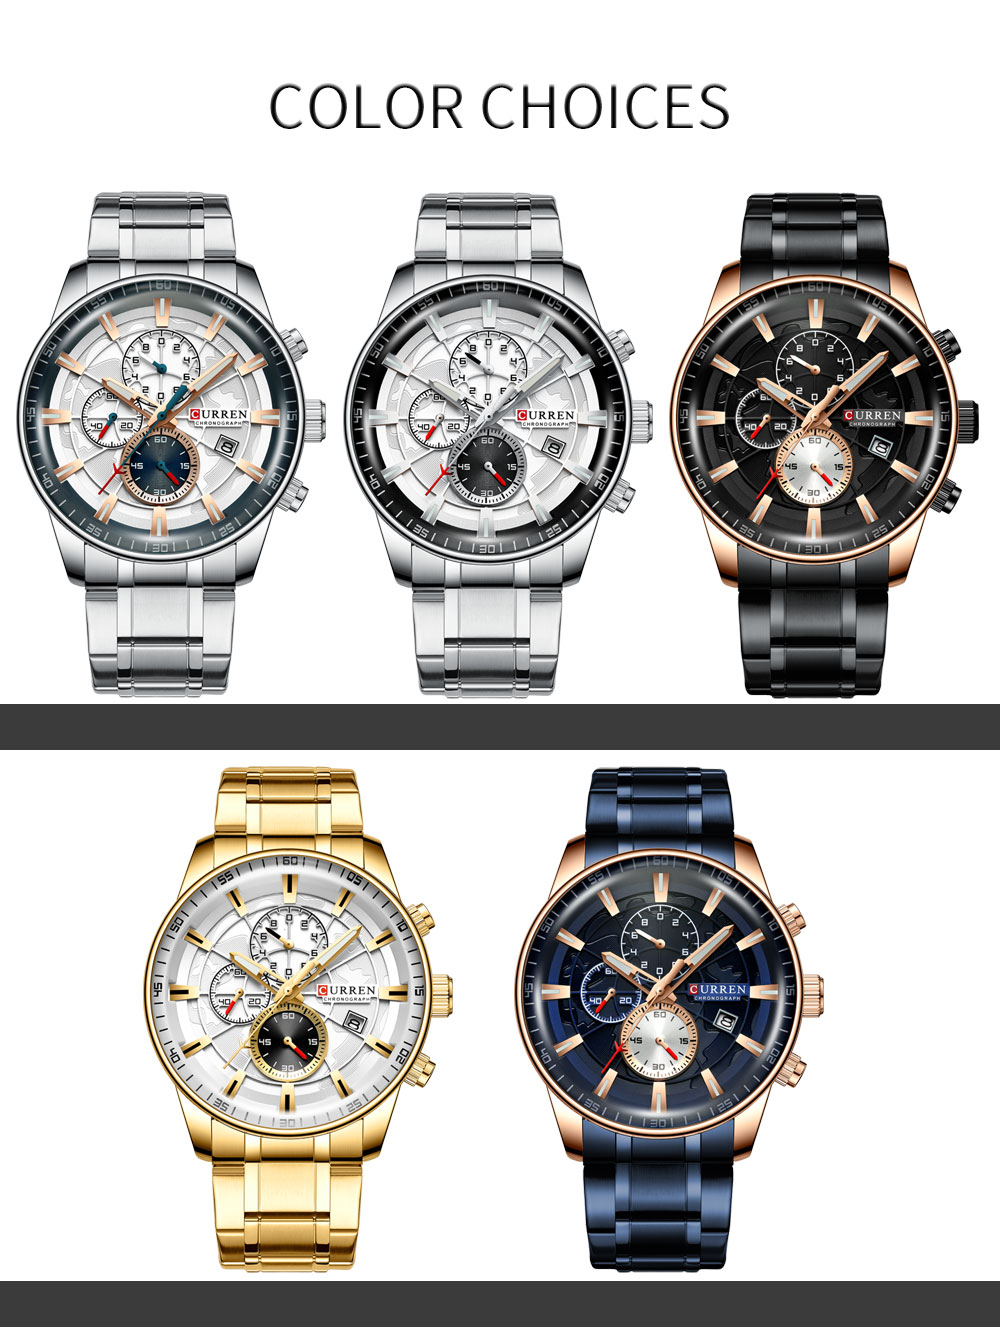 H1513fdb2118a46f39253c1c94dab47b8I Men's Watches CURREN Top Luxury Brand Fashion Quartz Men Watch Waterproof Chronograph Business Wristwatch Relogio Masculino